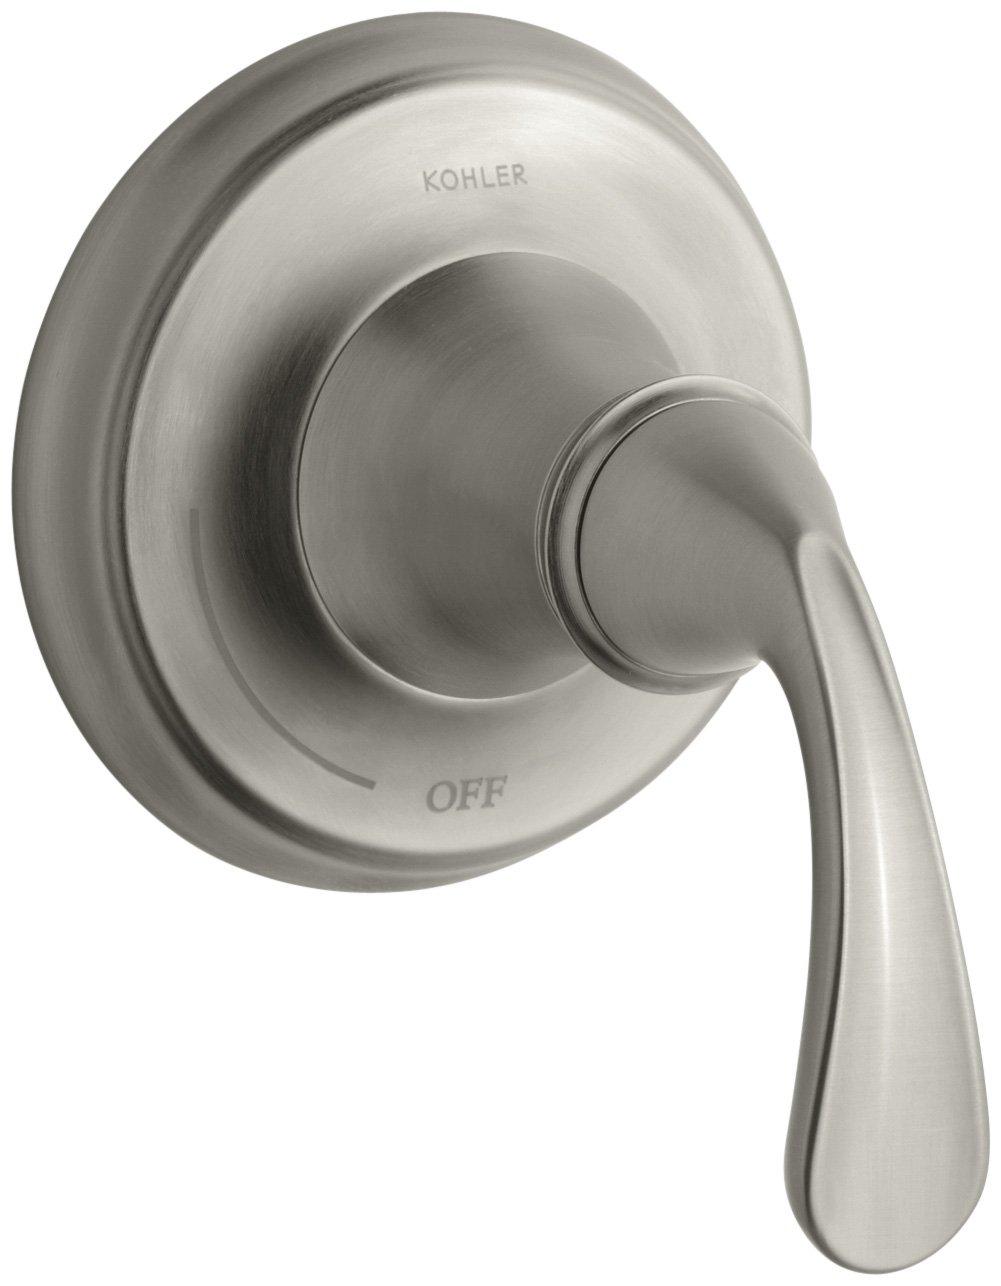 KOHLER K-T10360-4-BN Forte Volume Control Trim, Vibrant Brushed Nickel